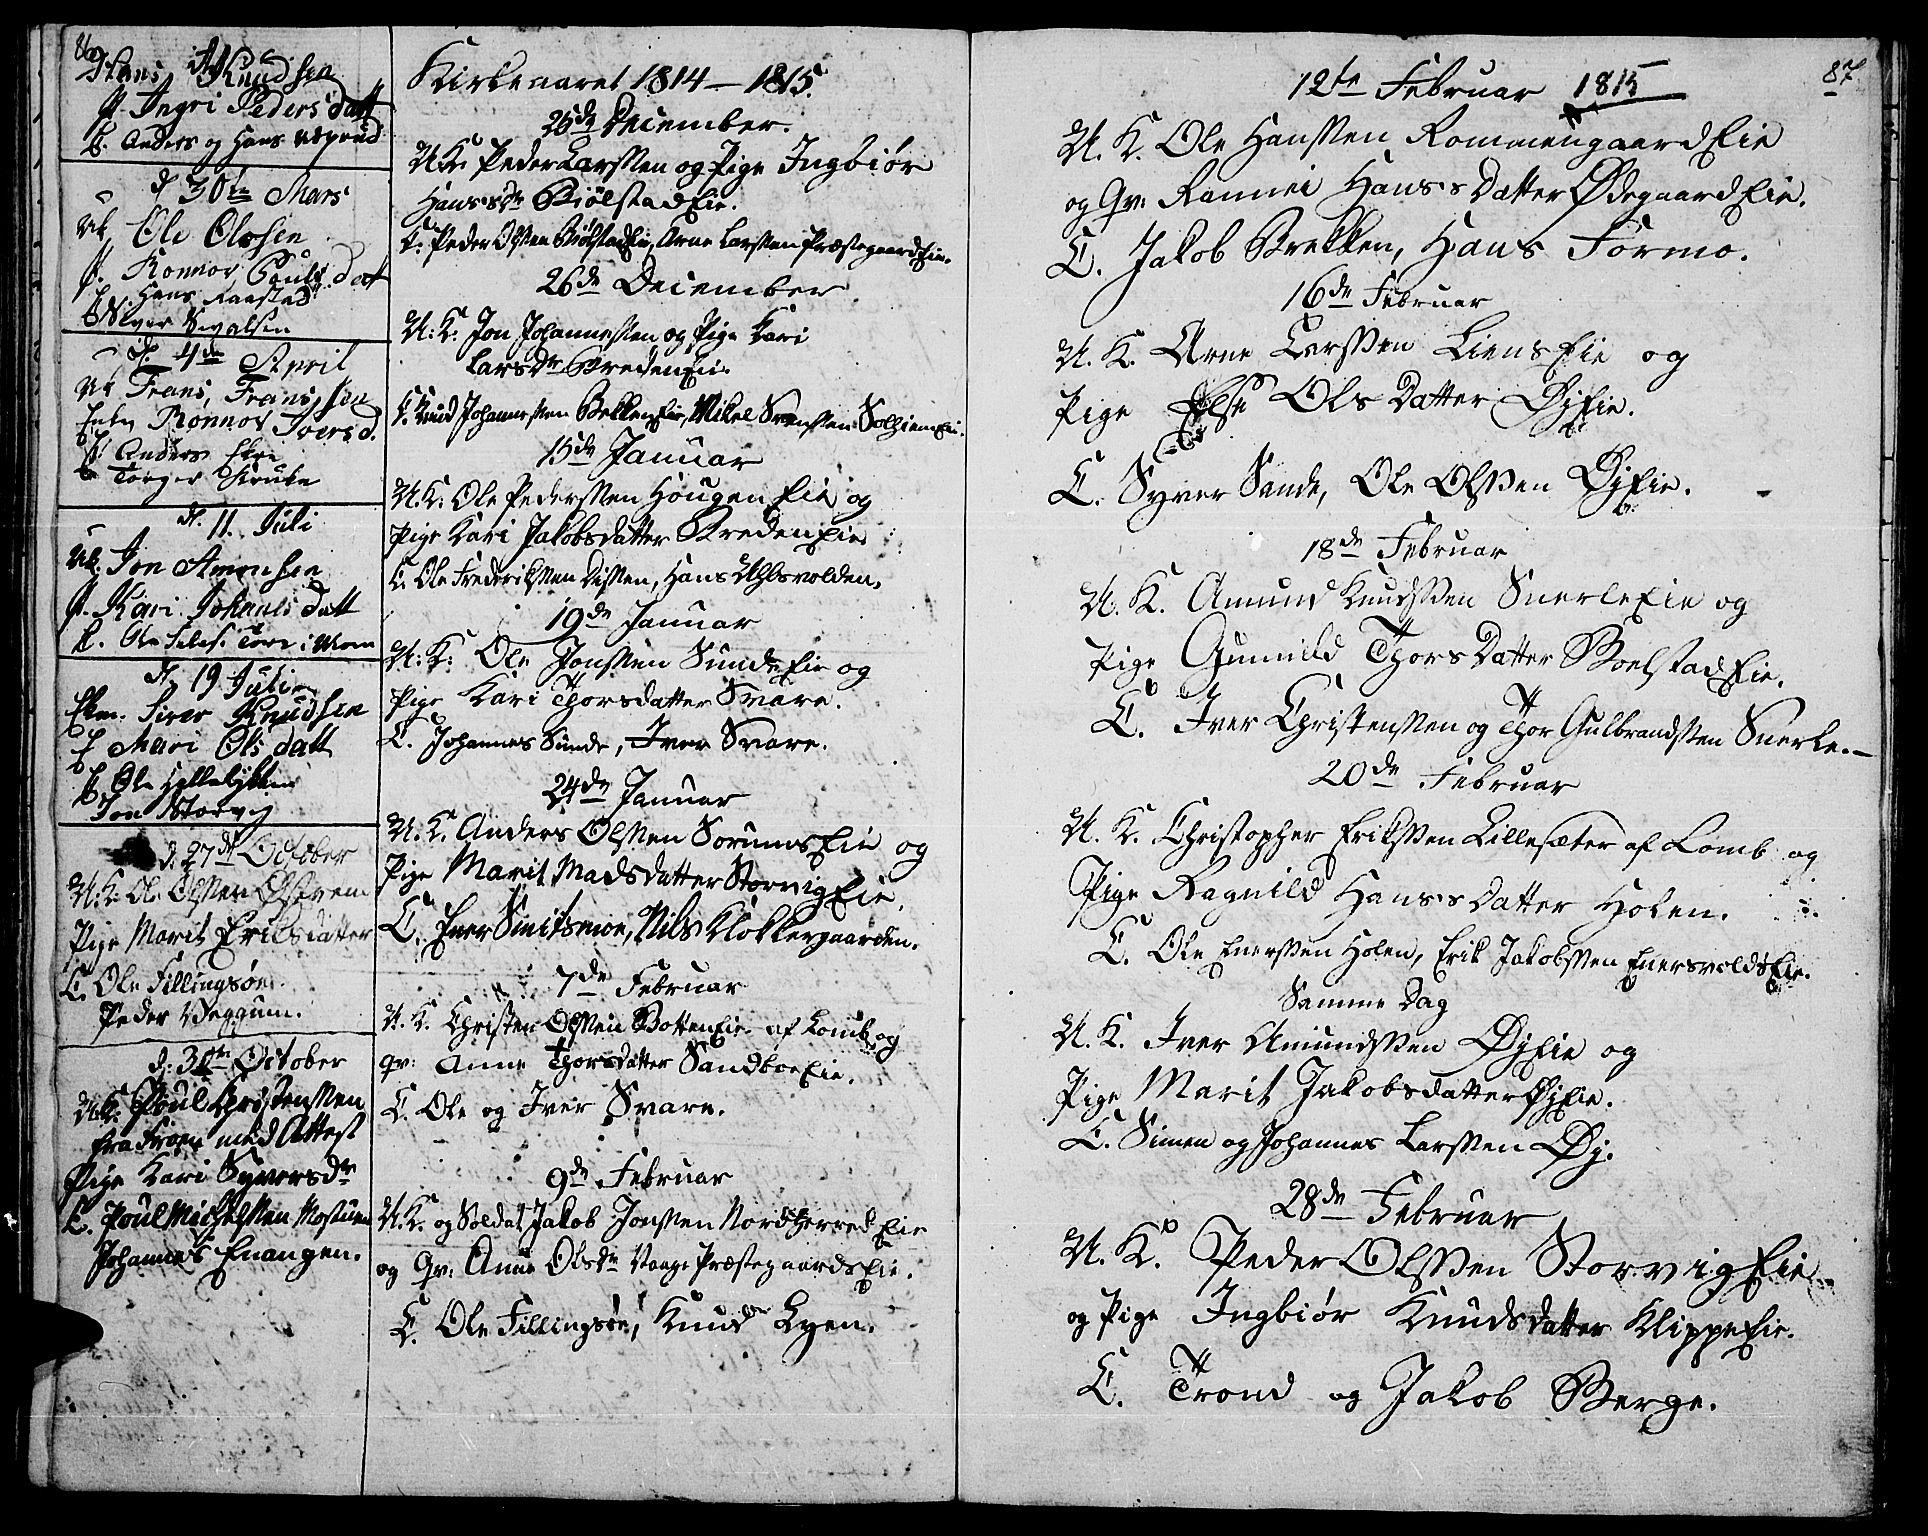 SAH, Vågå prestekontor, Ministerialbok nr. 2, 1810-1815, s. 86-87